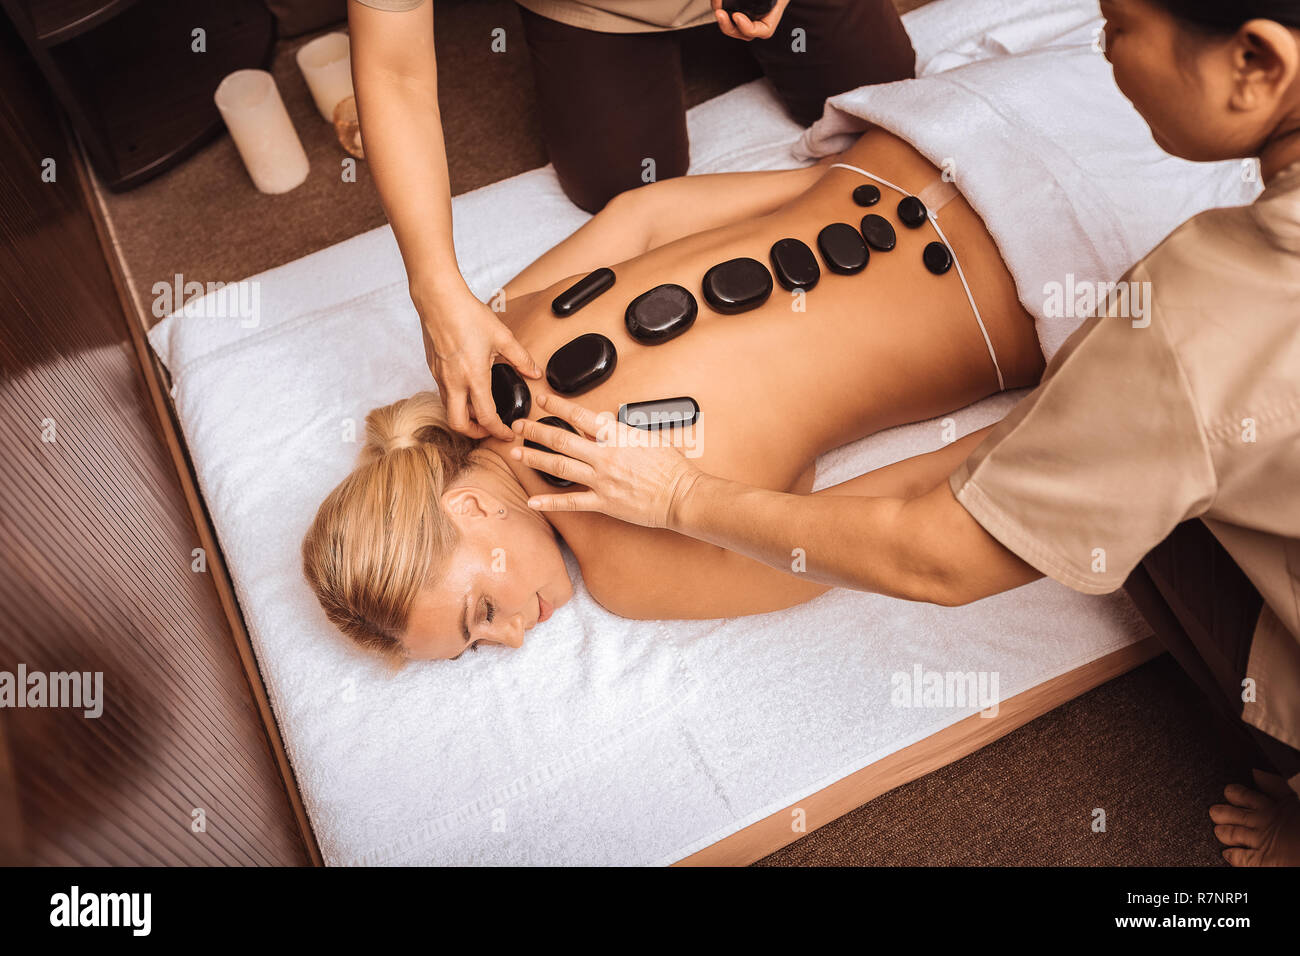 Professional Asian masseuses putting hot stones on female back Stock Photo